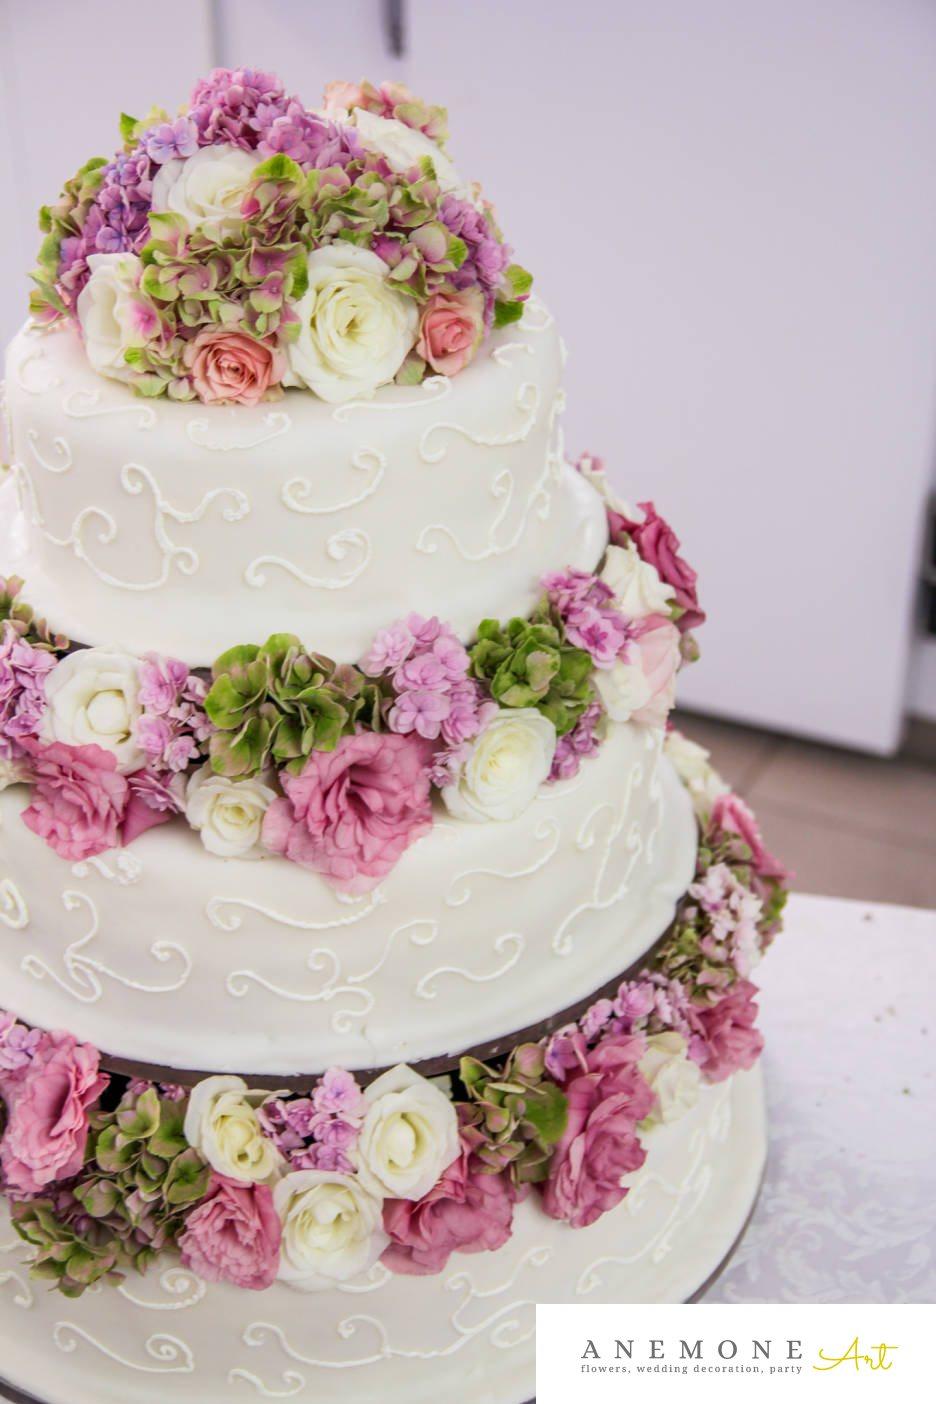 Poza, foto cu Flori de nunta alb, decor tort, hortensia, lisianthus, roz, trandafiri in Arad, Timisoara, Oradea (wedding flowers, bouquets) nunta Arad, Timisoara, Oradea